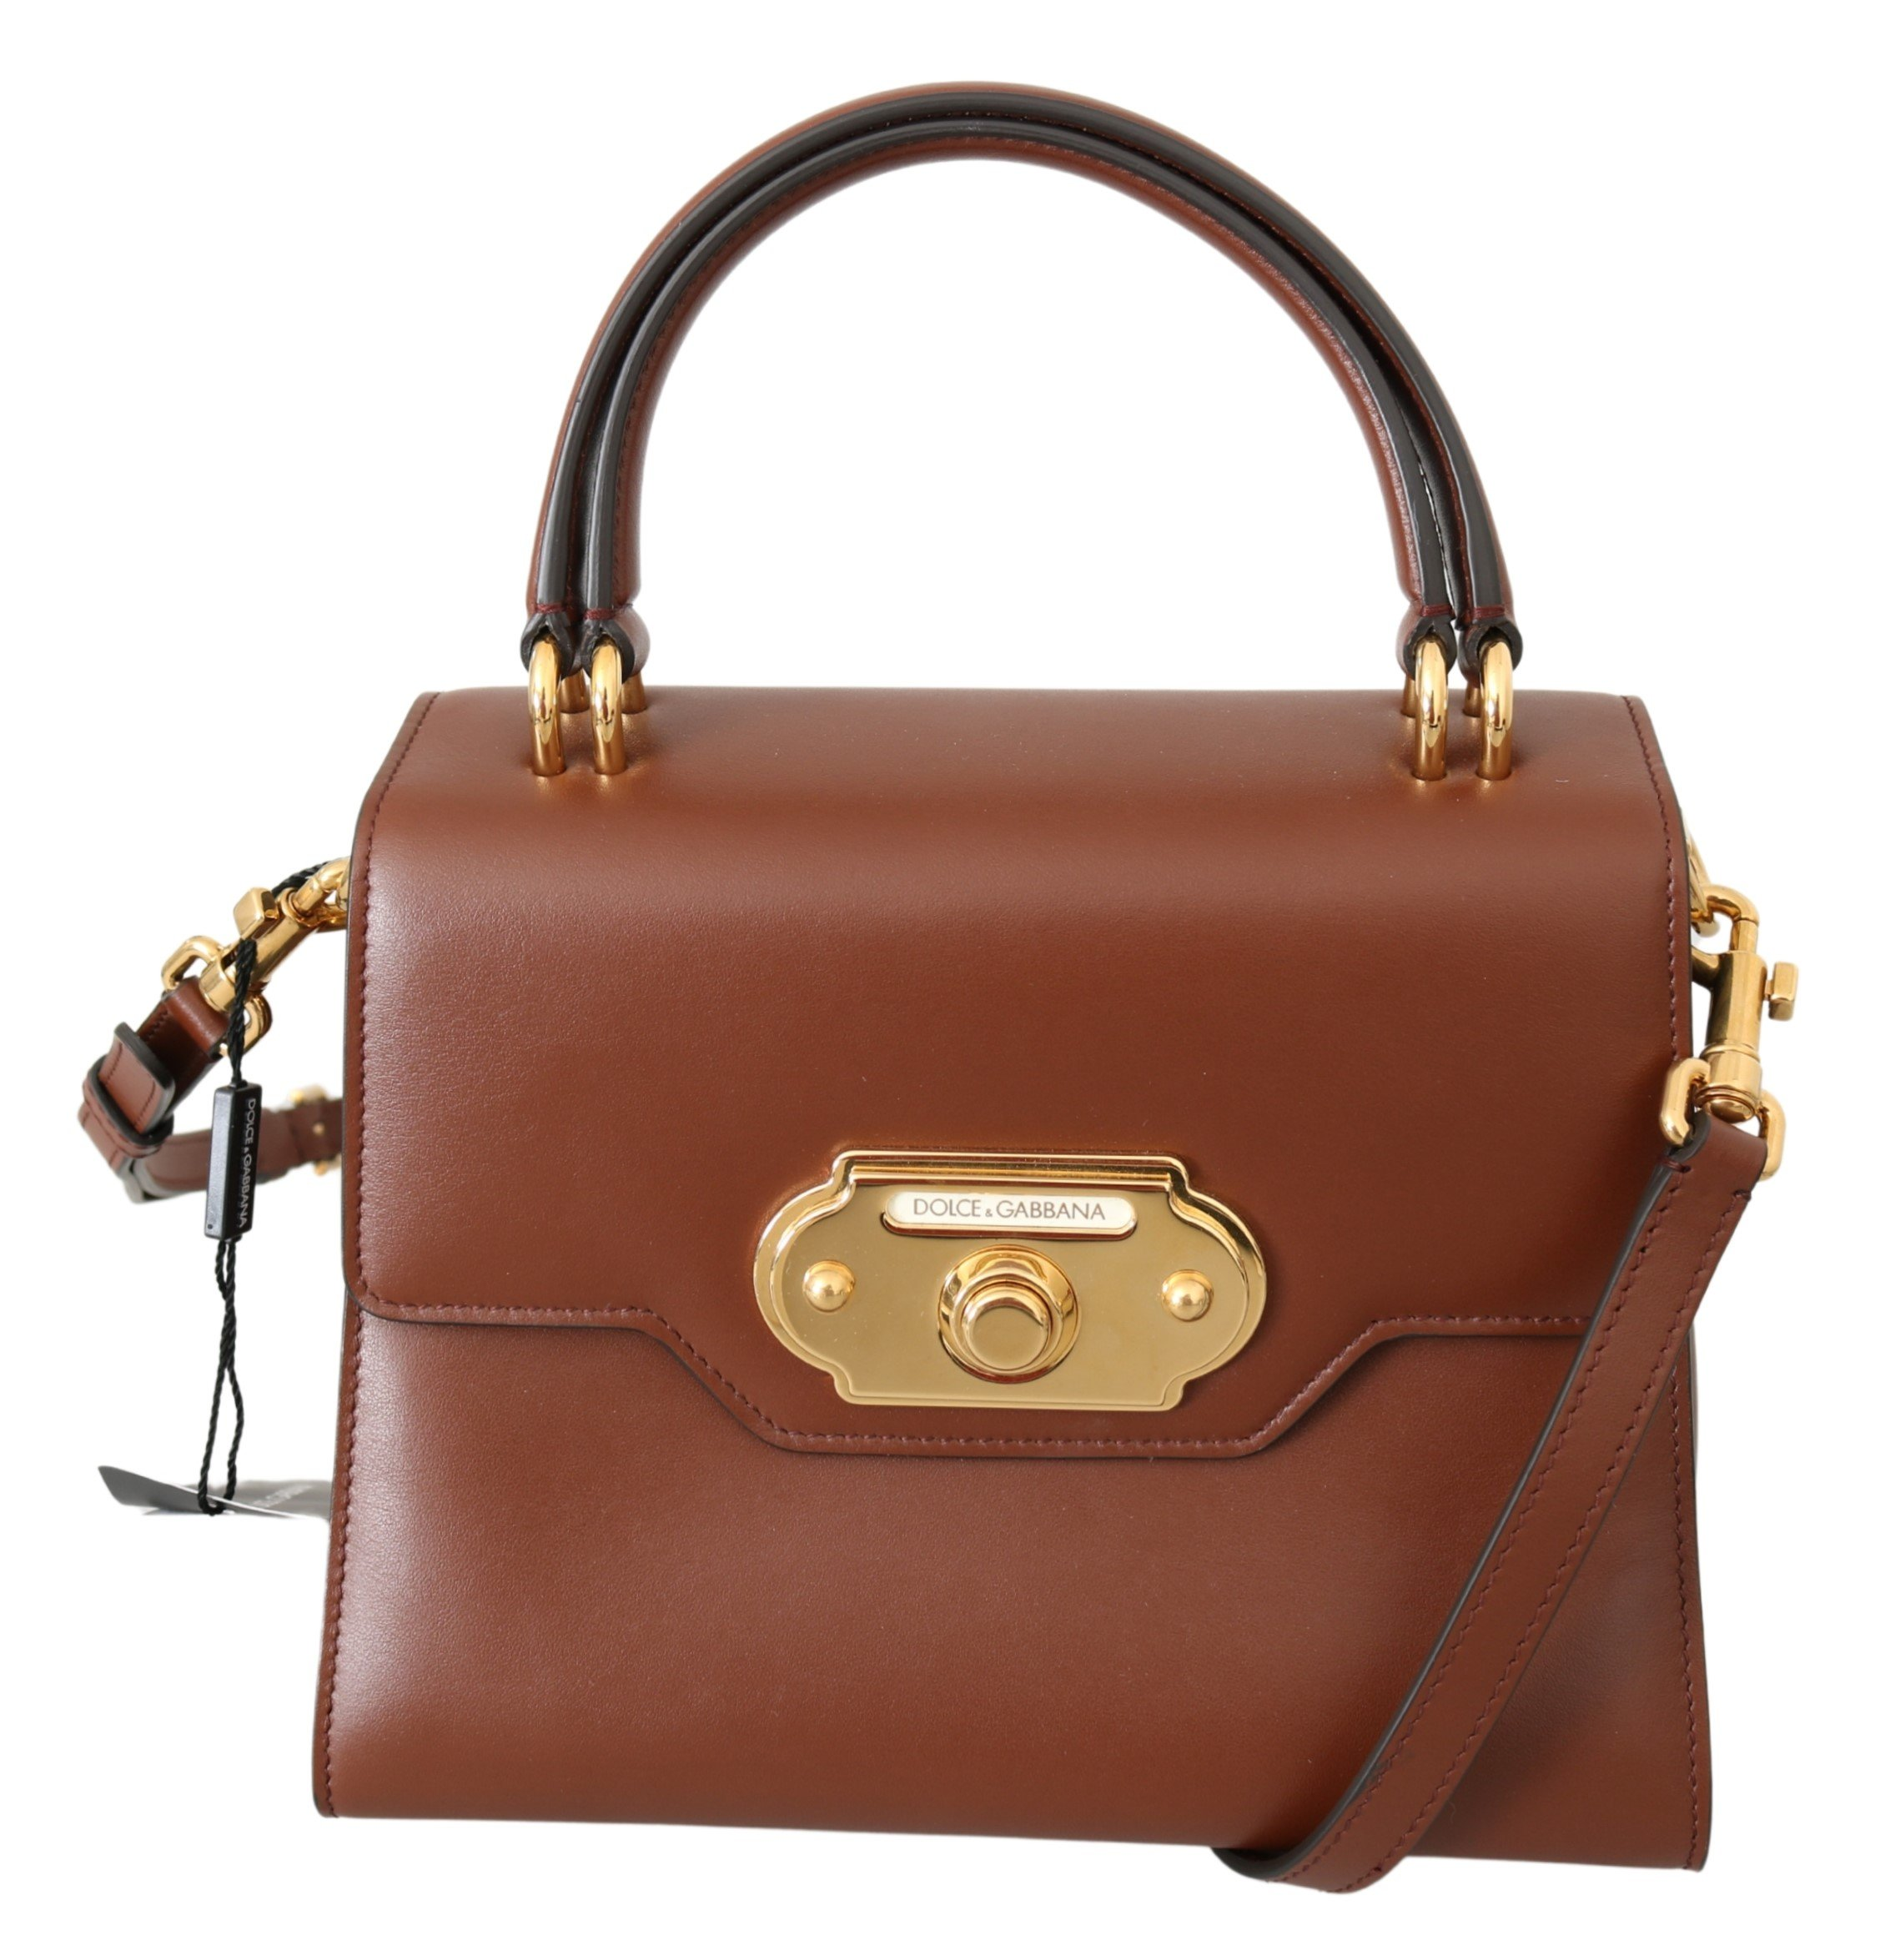 Dolce & Gabbana Women's Leather WELCOME Crossbody Bag Brown VAS9960